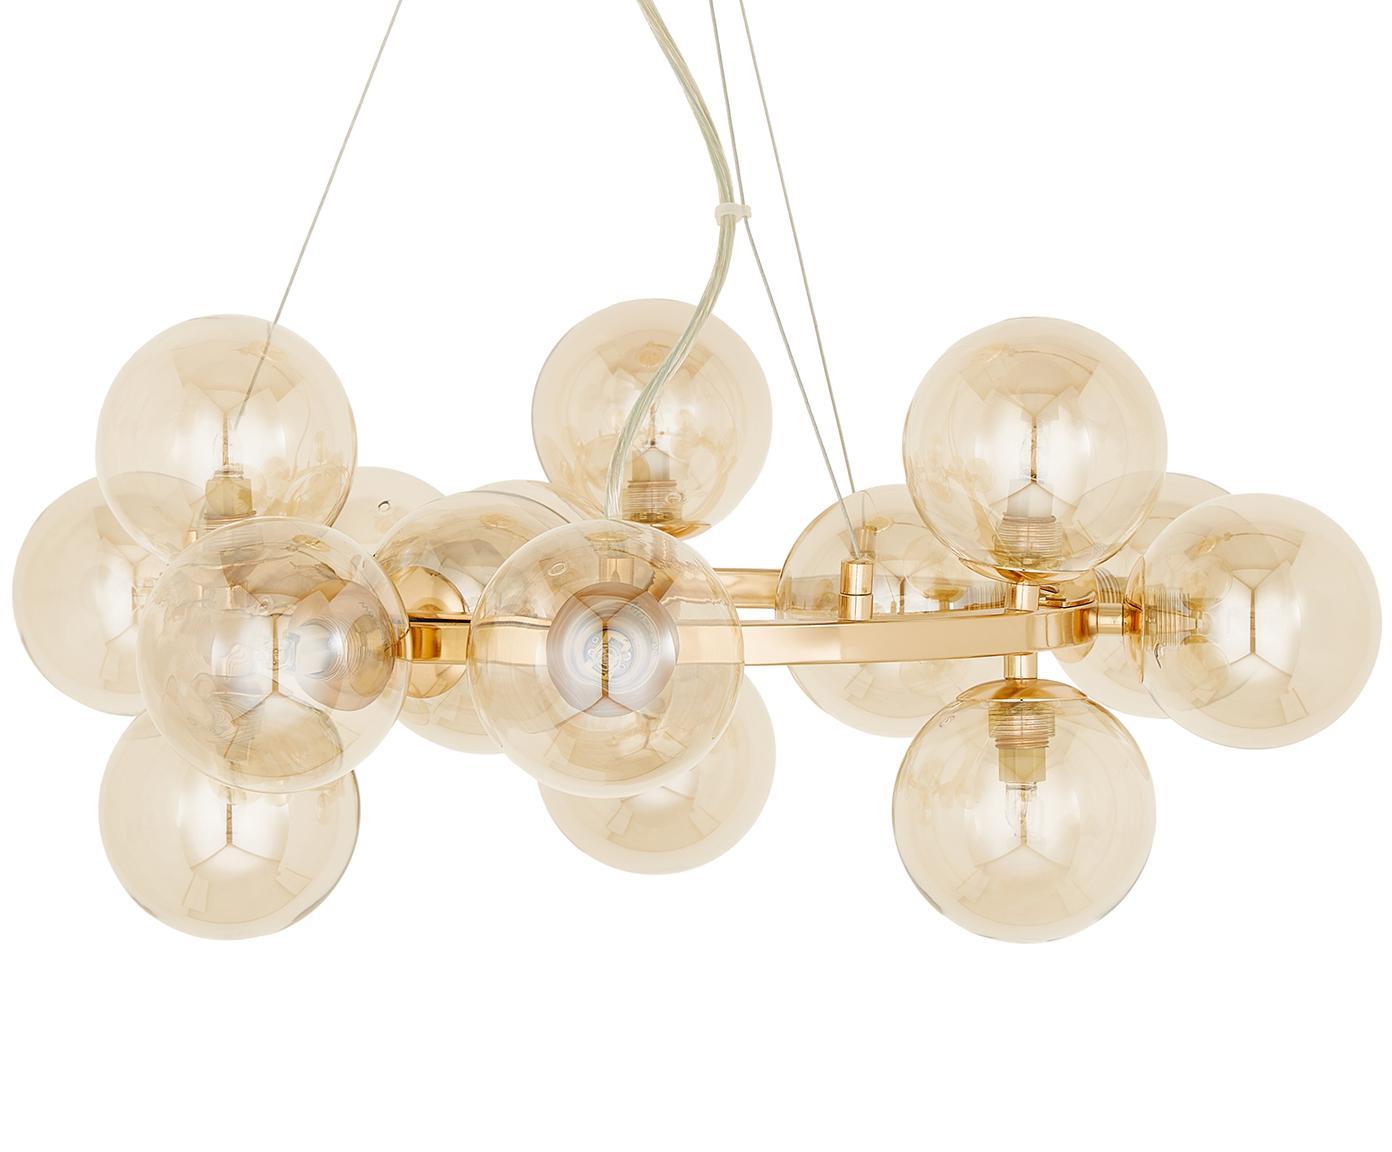 Glaskugel-Pendelleuchte Splendor, Kupferfarben, Ø 58 x H 22 cm